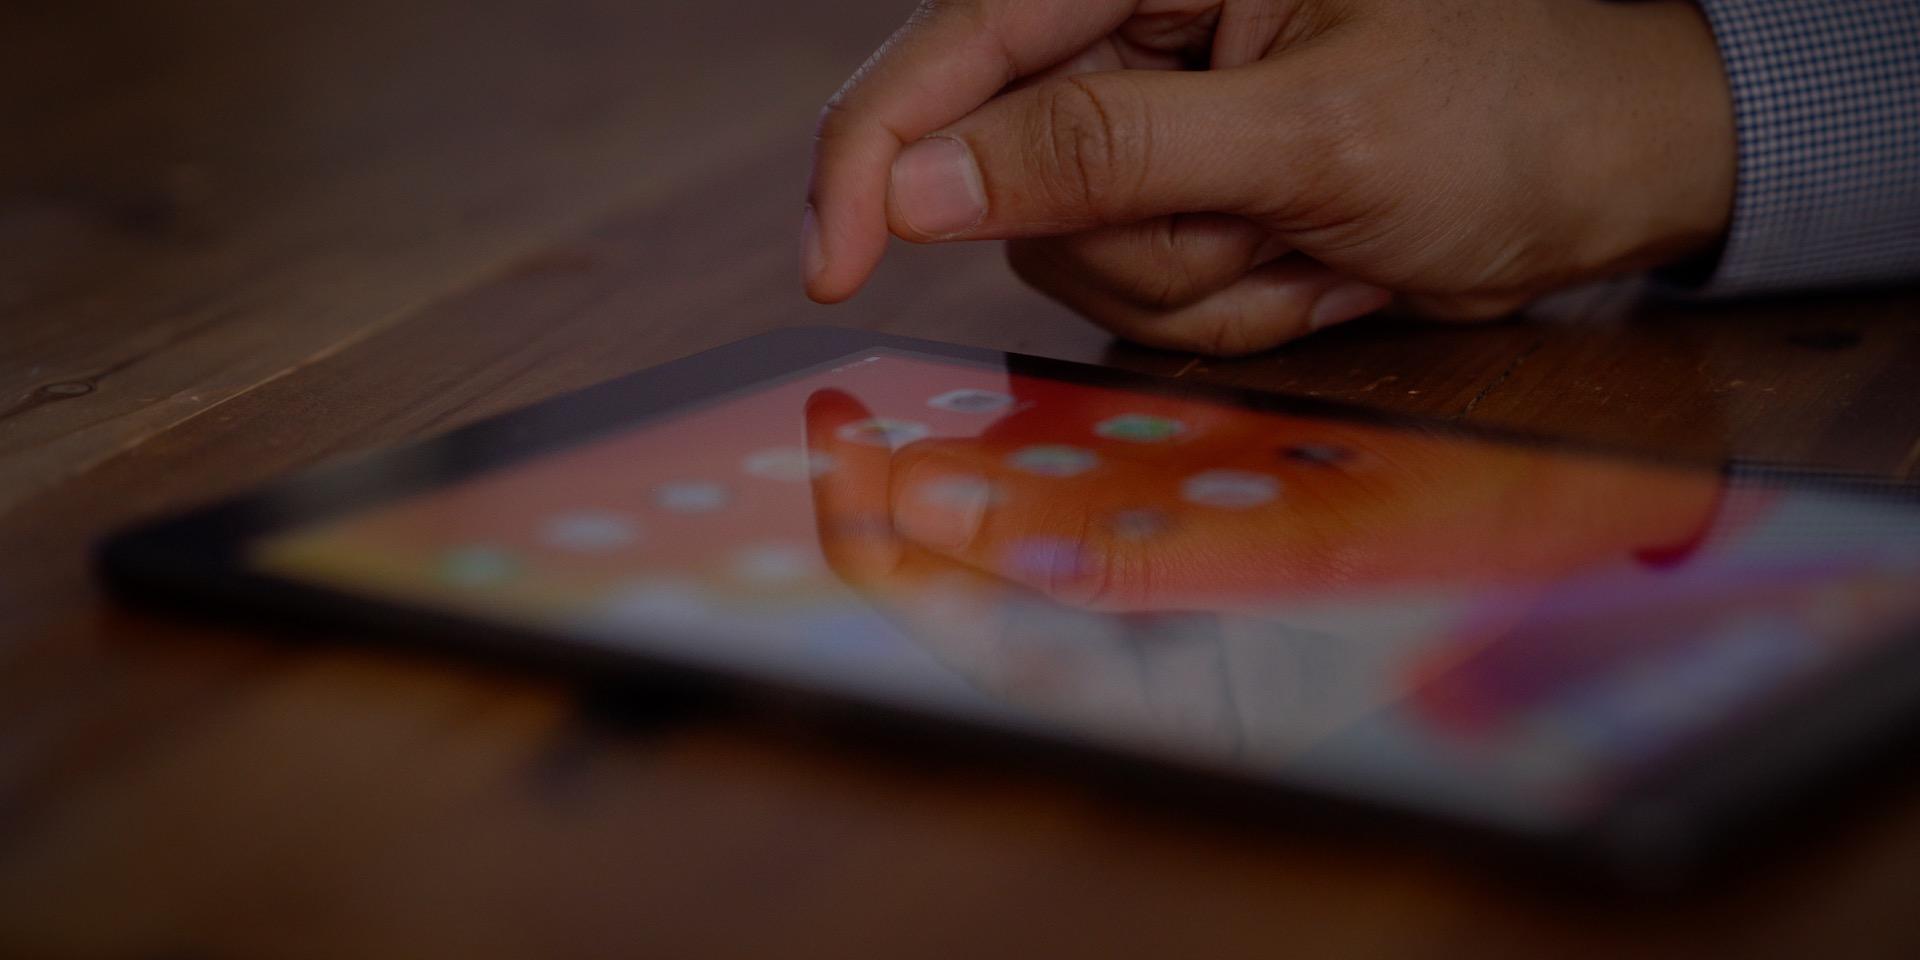 seventh-gen iPad non-laminated display